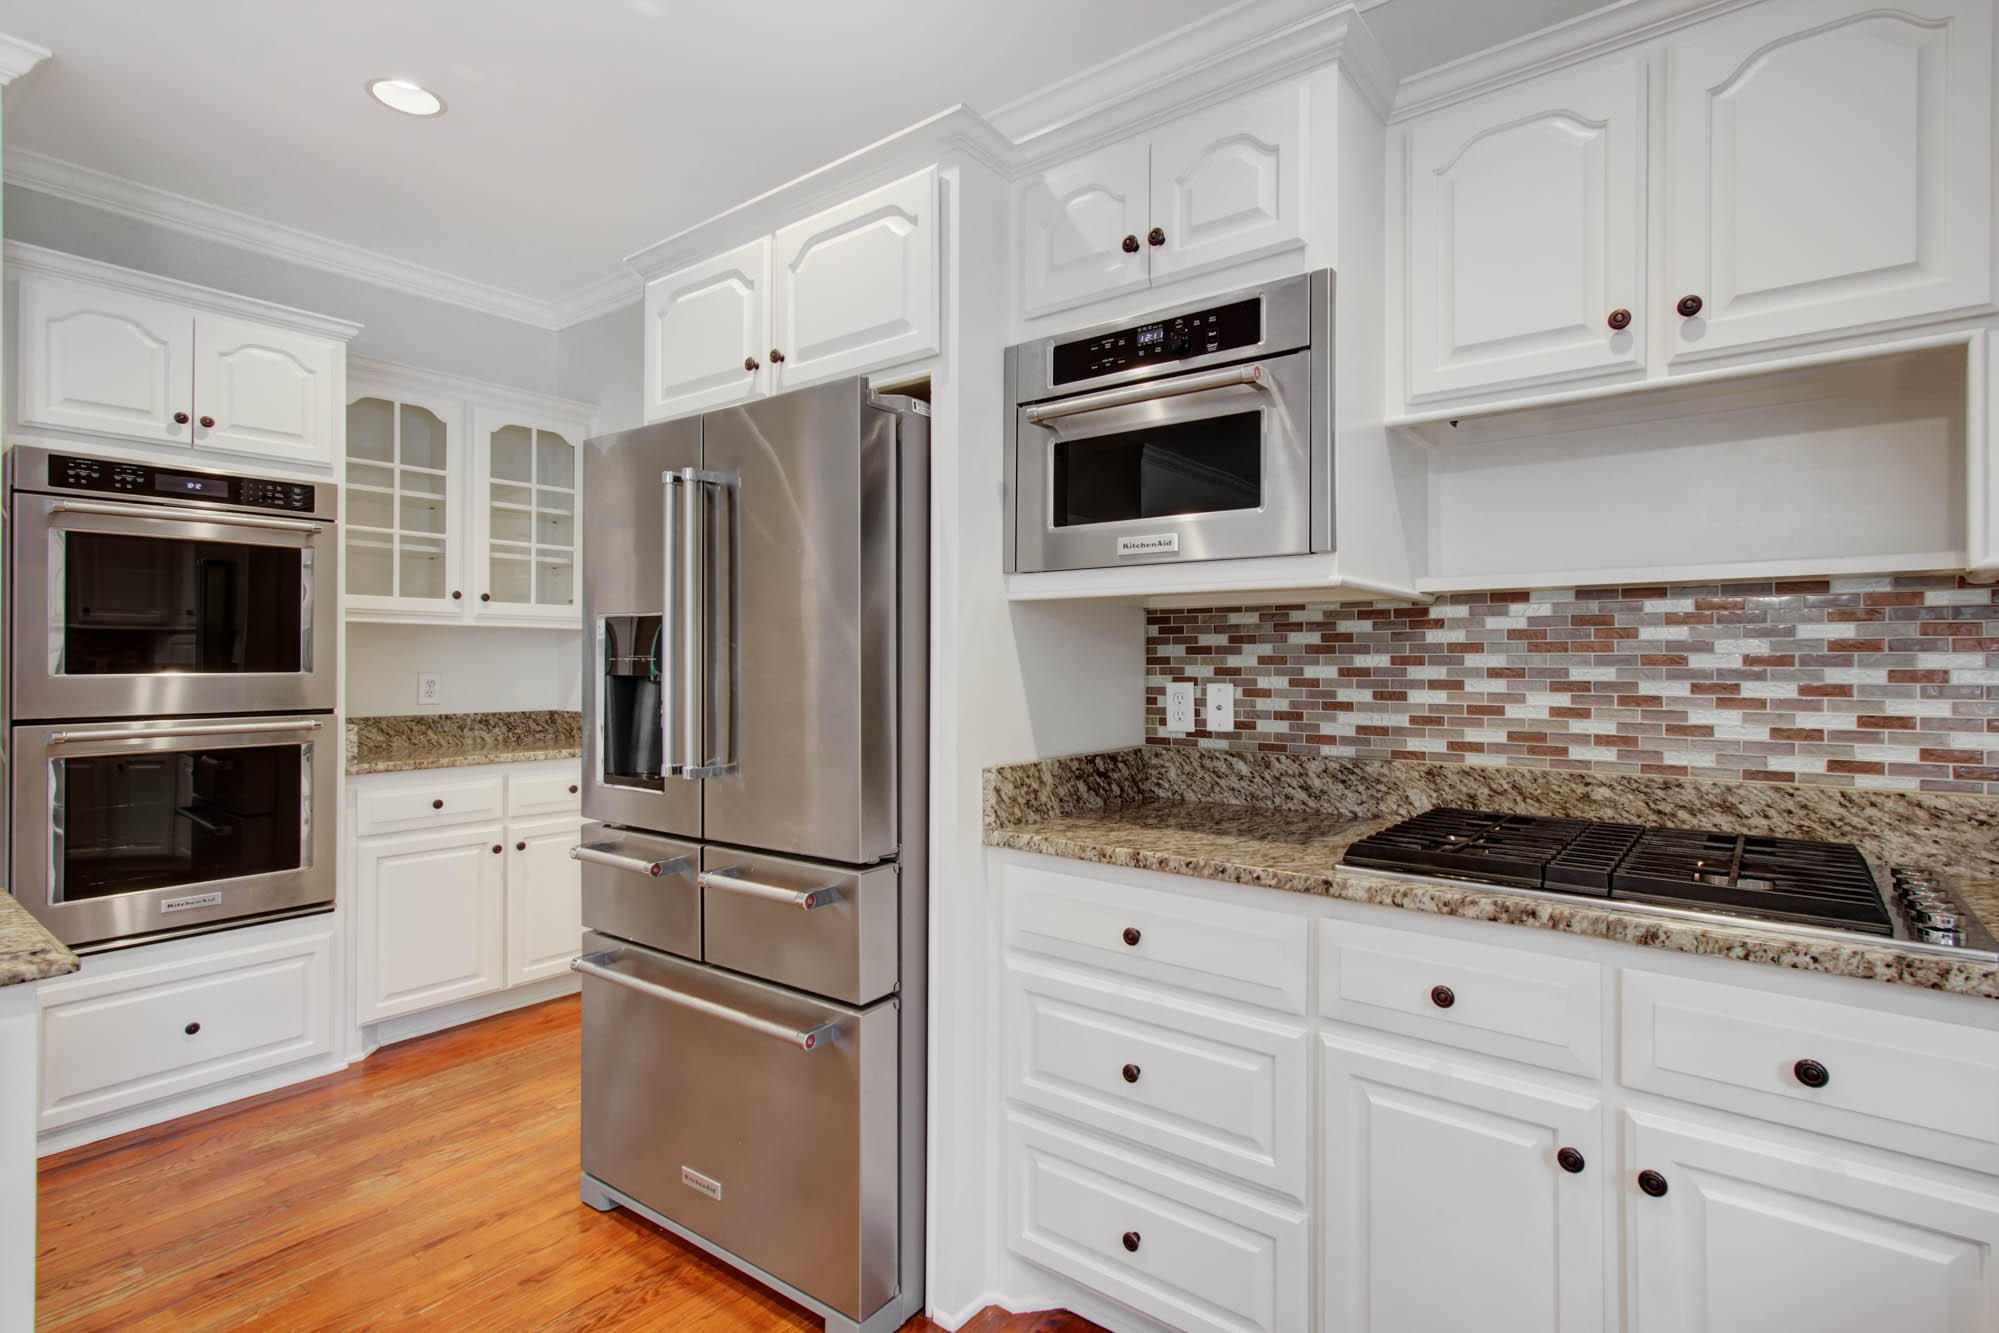 Dunes West Homes For Sale - 3515 Colonel Vanderhorst, Mount Pleasant, SC - 45